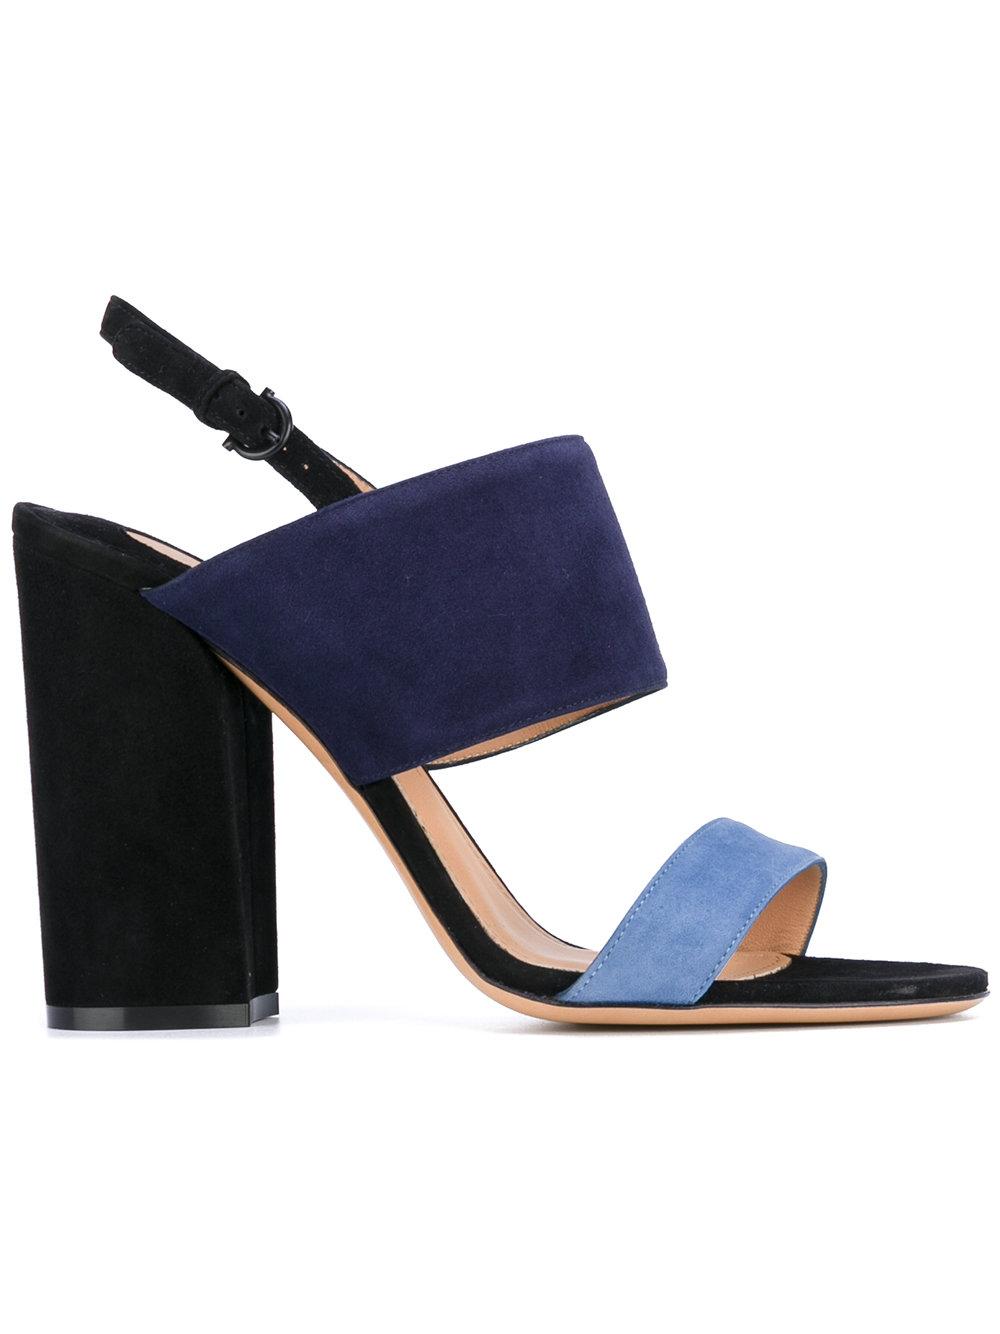 691842d8bef Salvatore Ferragamo Open Toe Sandals - Farfetch